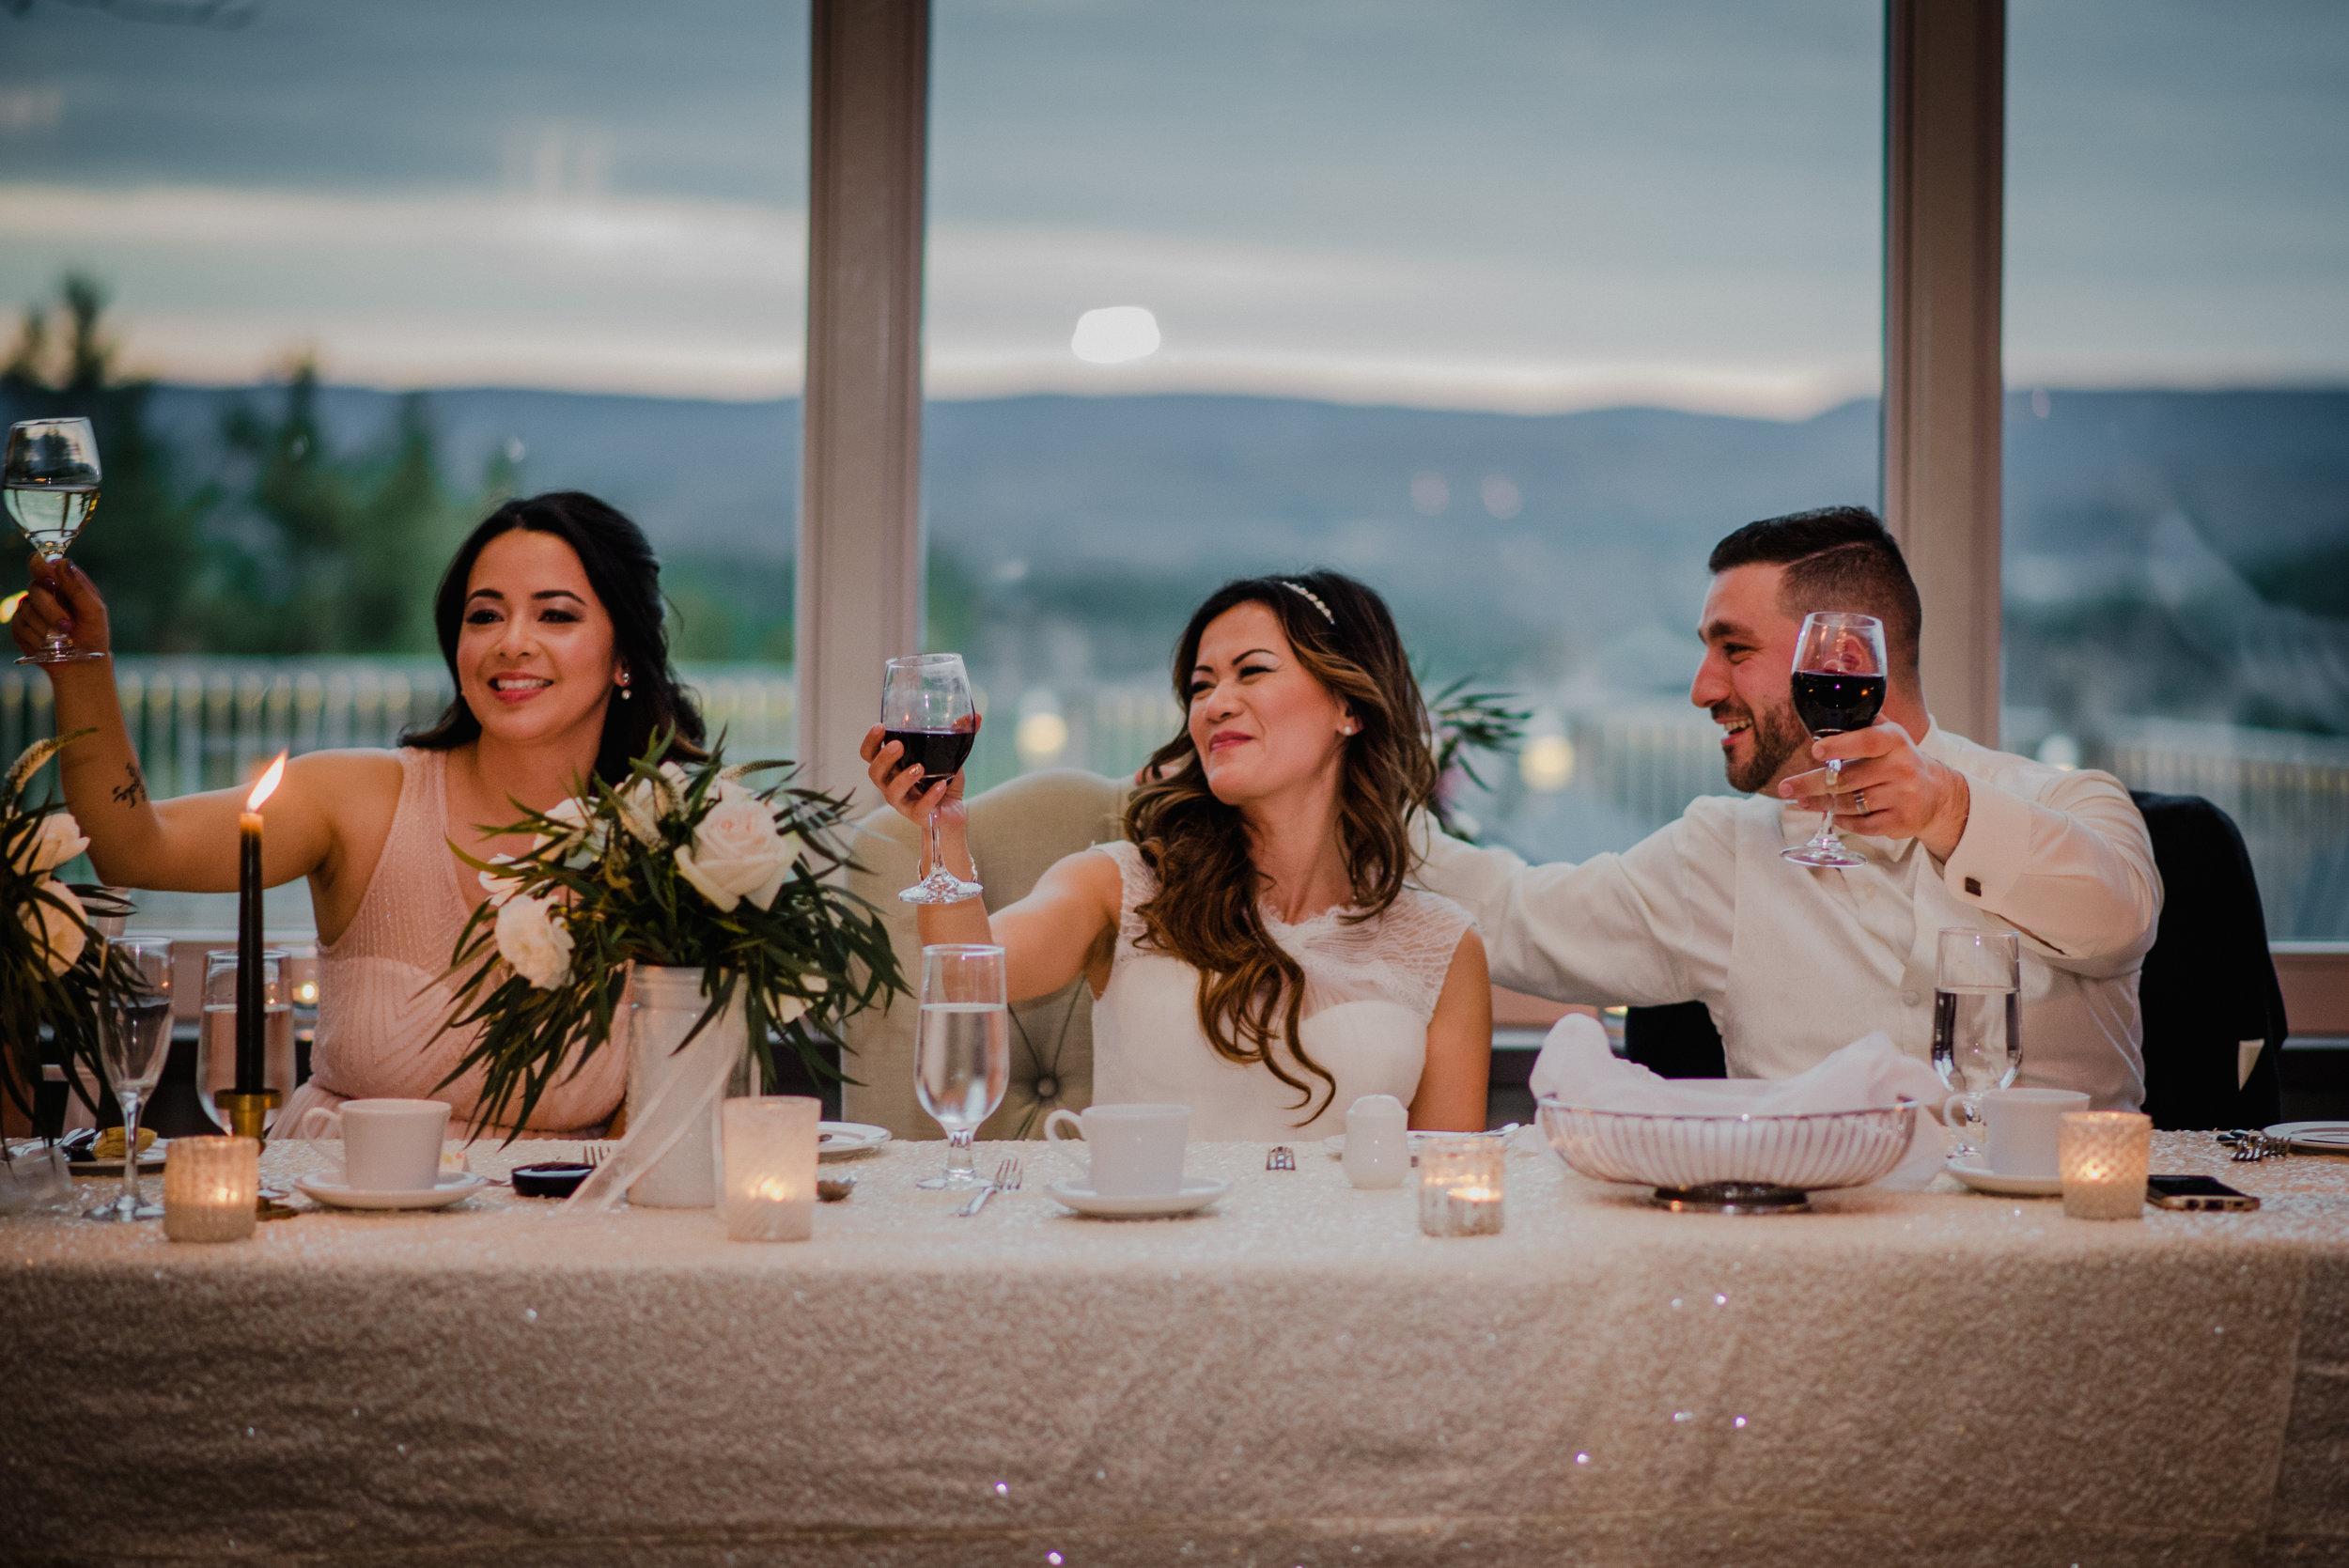 e Belvedere, Wakefield Wedding - Dinner Party 5